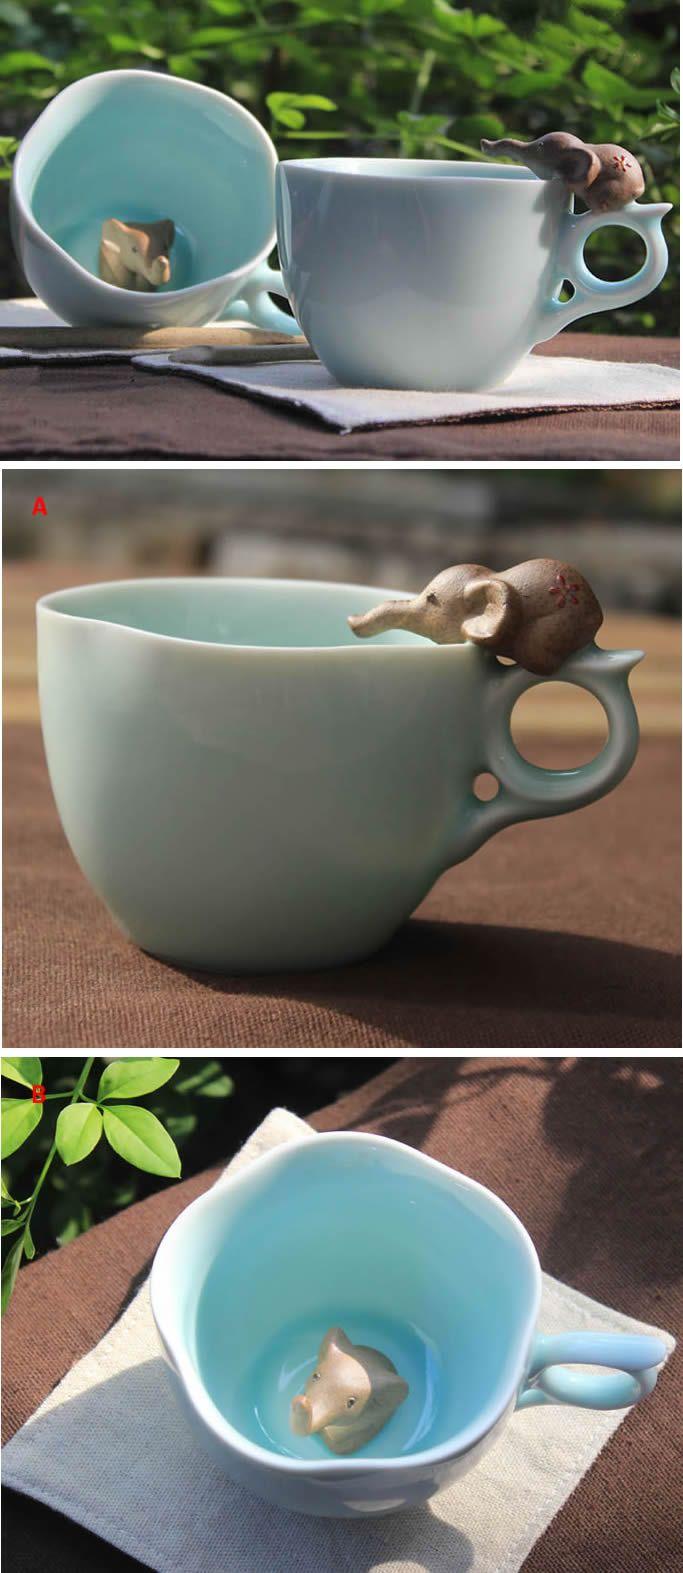 Ceramic Elephant Figurine Coffee Cup Coffee Mug                                                                                                                                                                                 More